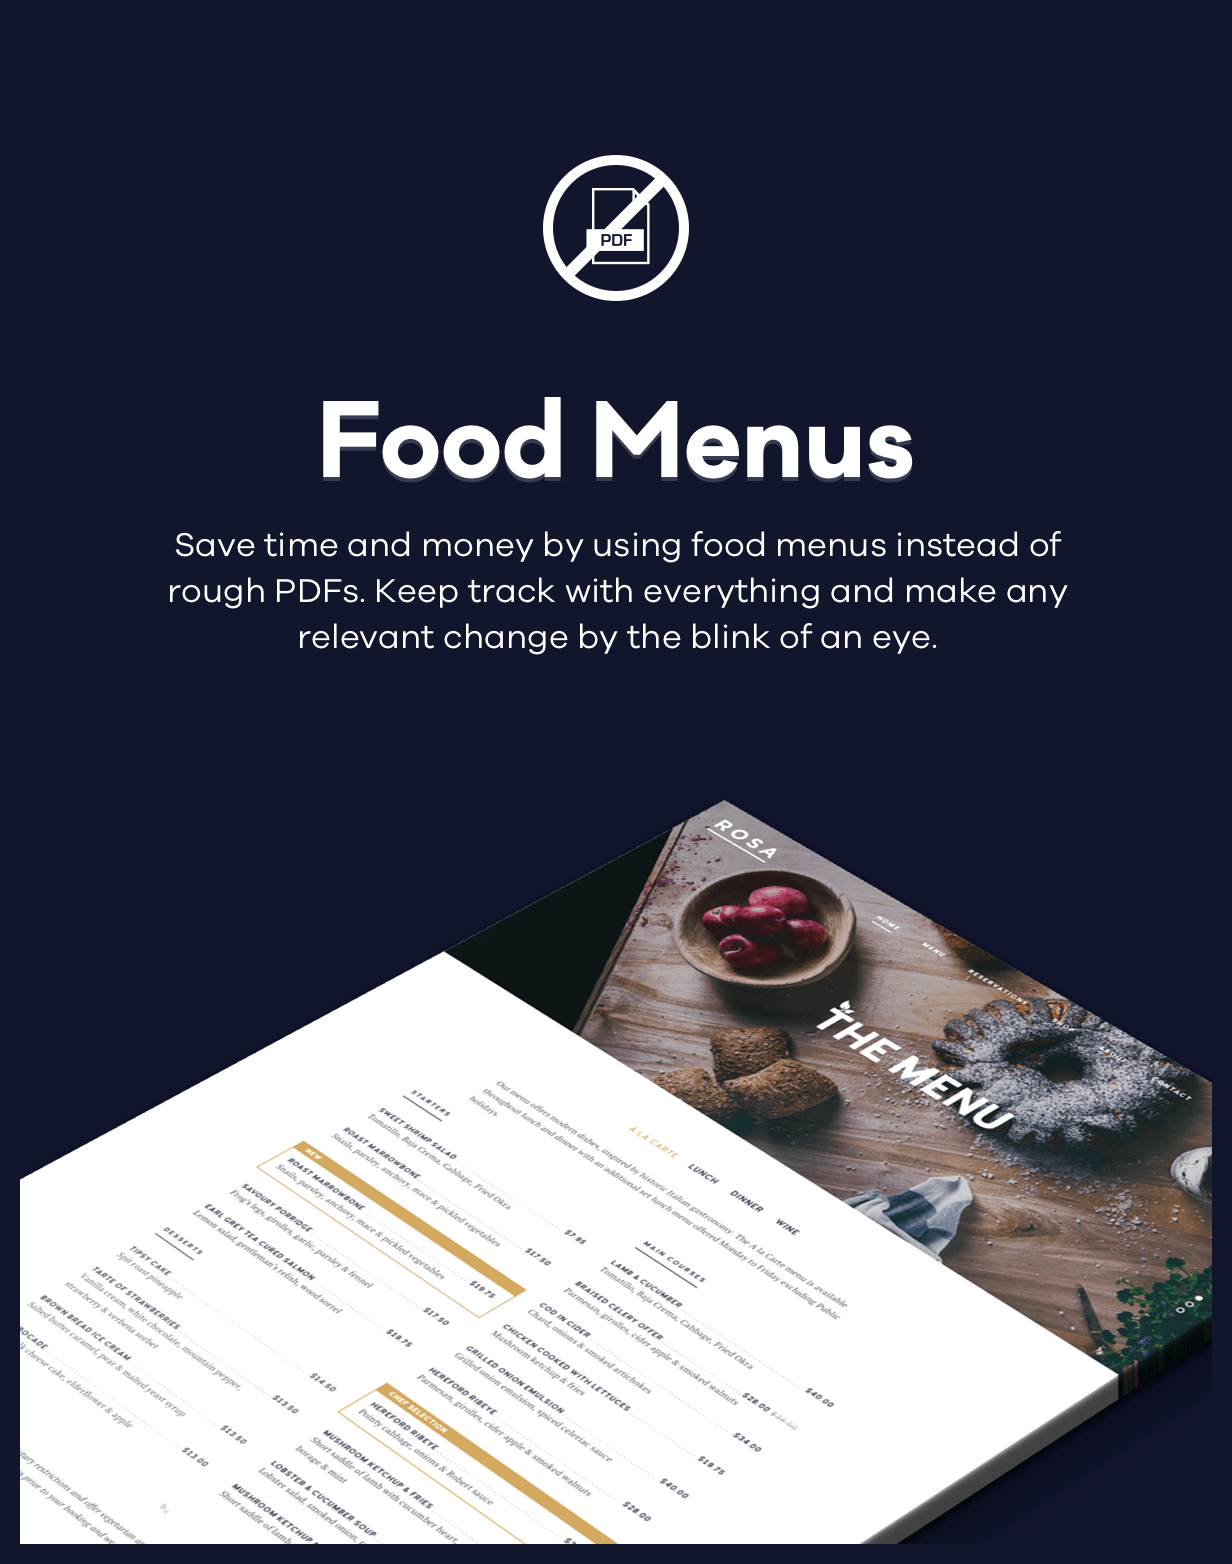 rosa food menus - ROSA 1 - An Exquisite Restaurant WordPress Theme